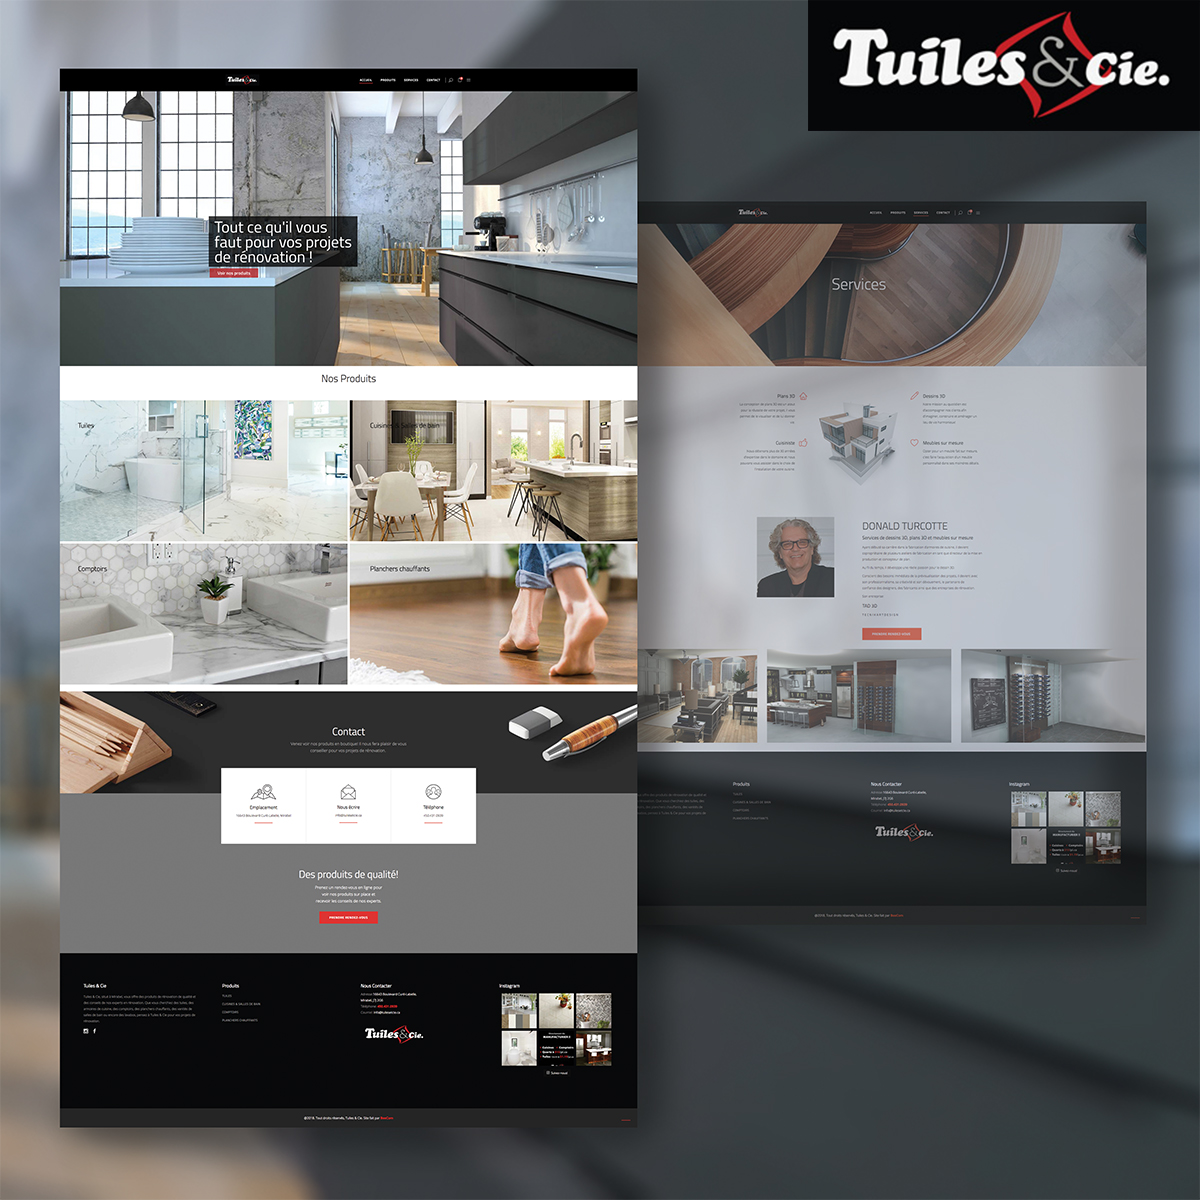 Tuiles&Cie_mockup_portfolio_Instagram